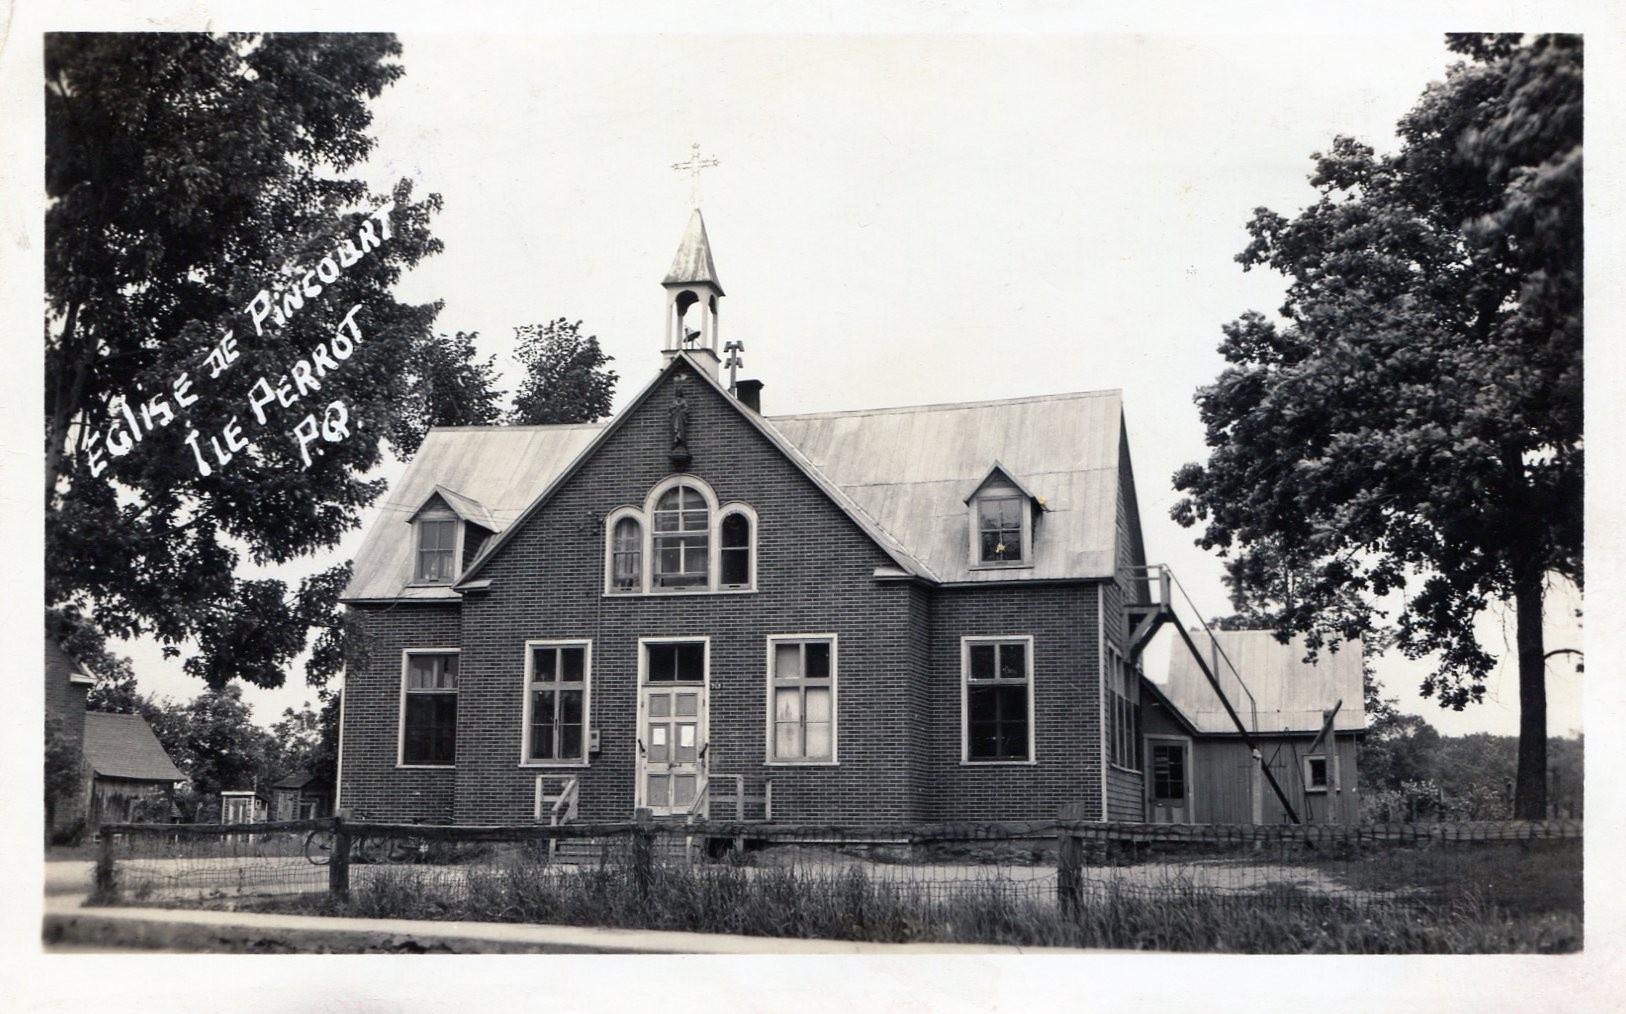 La_chapelle-ecole.jpg (372 KB)